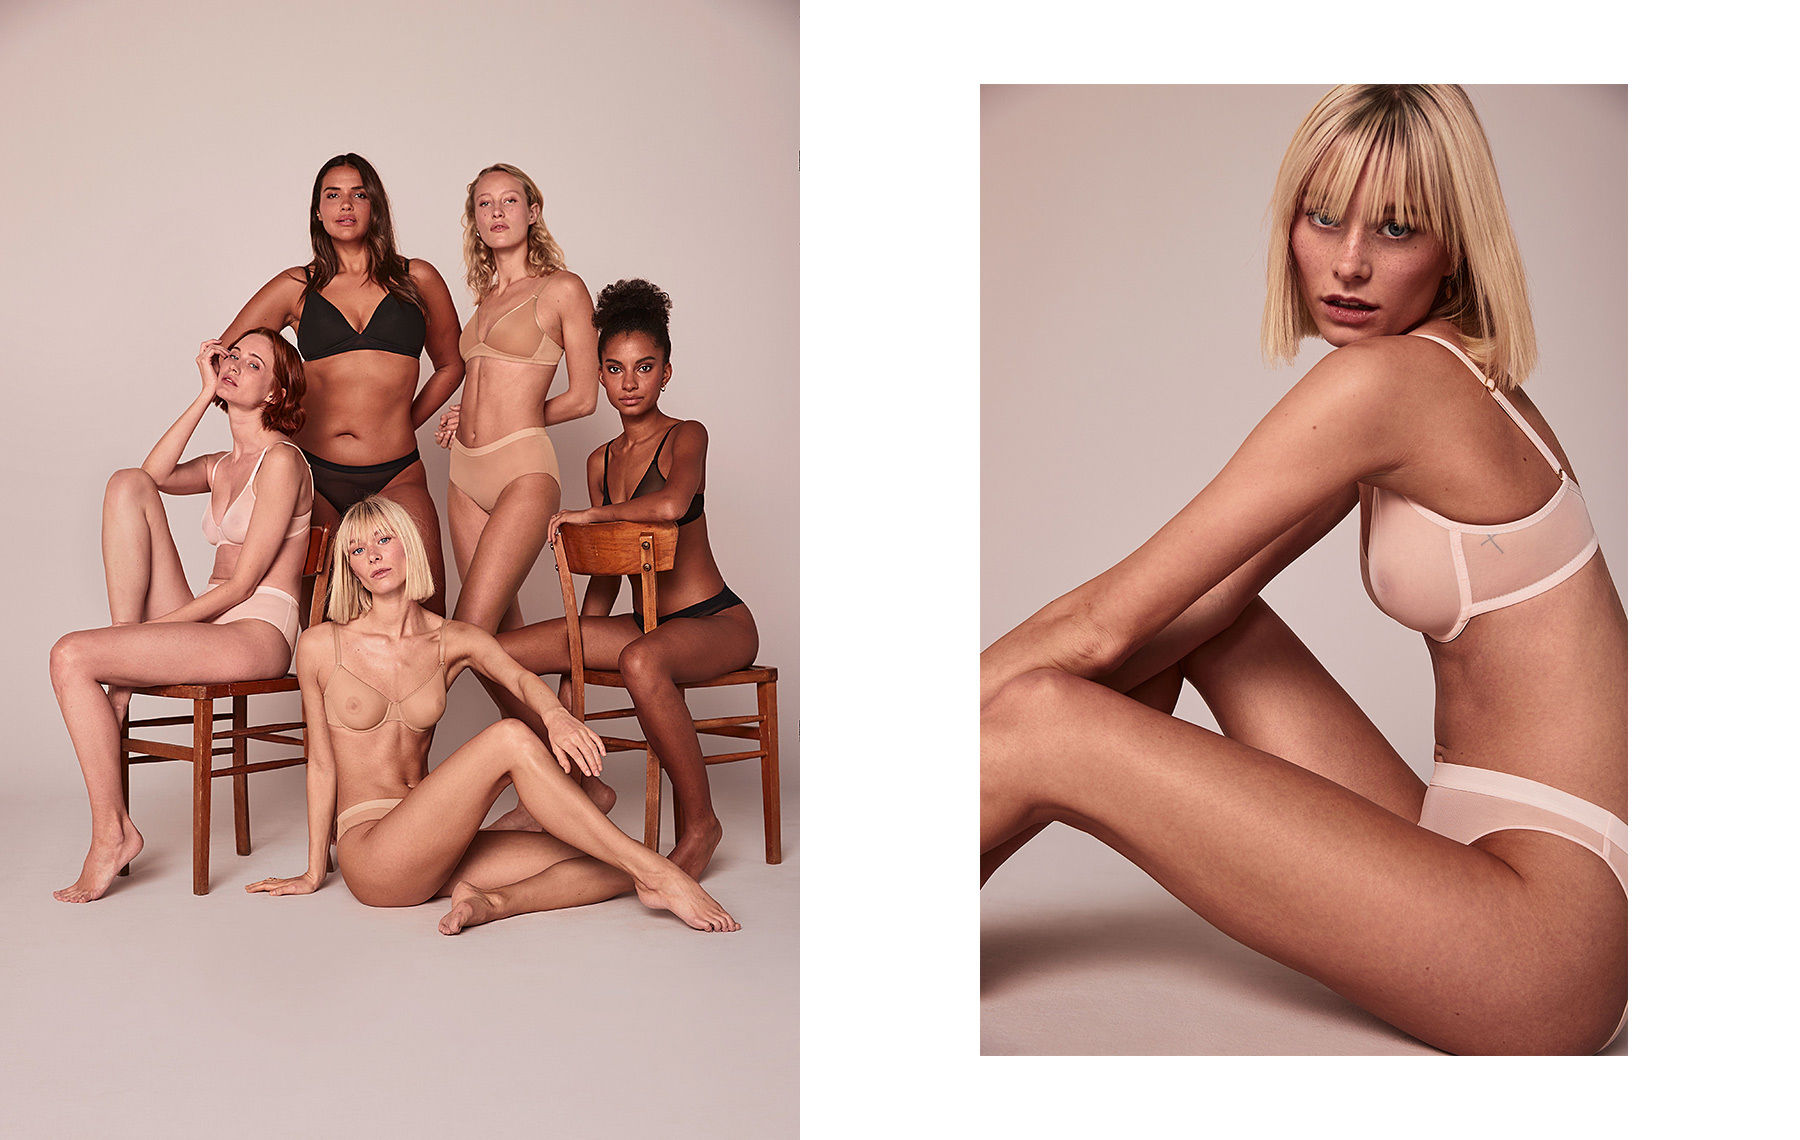 NINA KLEIN, Hair & Make Up: Tina Taii Schmoll for Speidel by Michael Berger